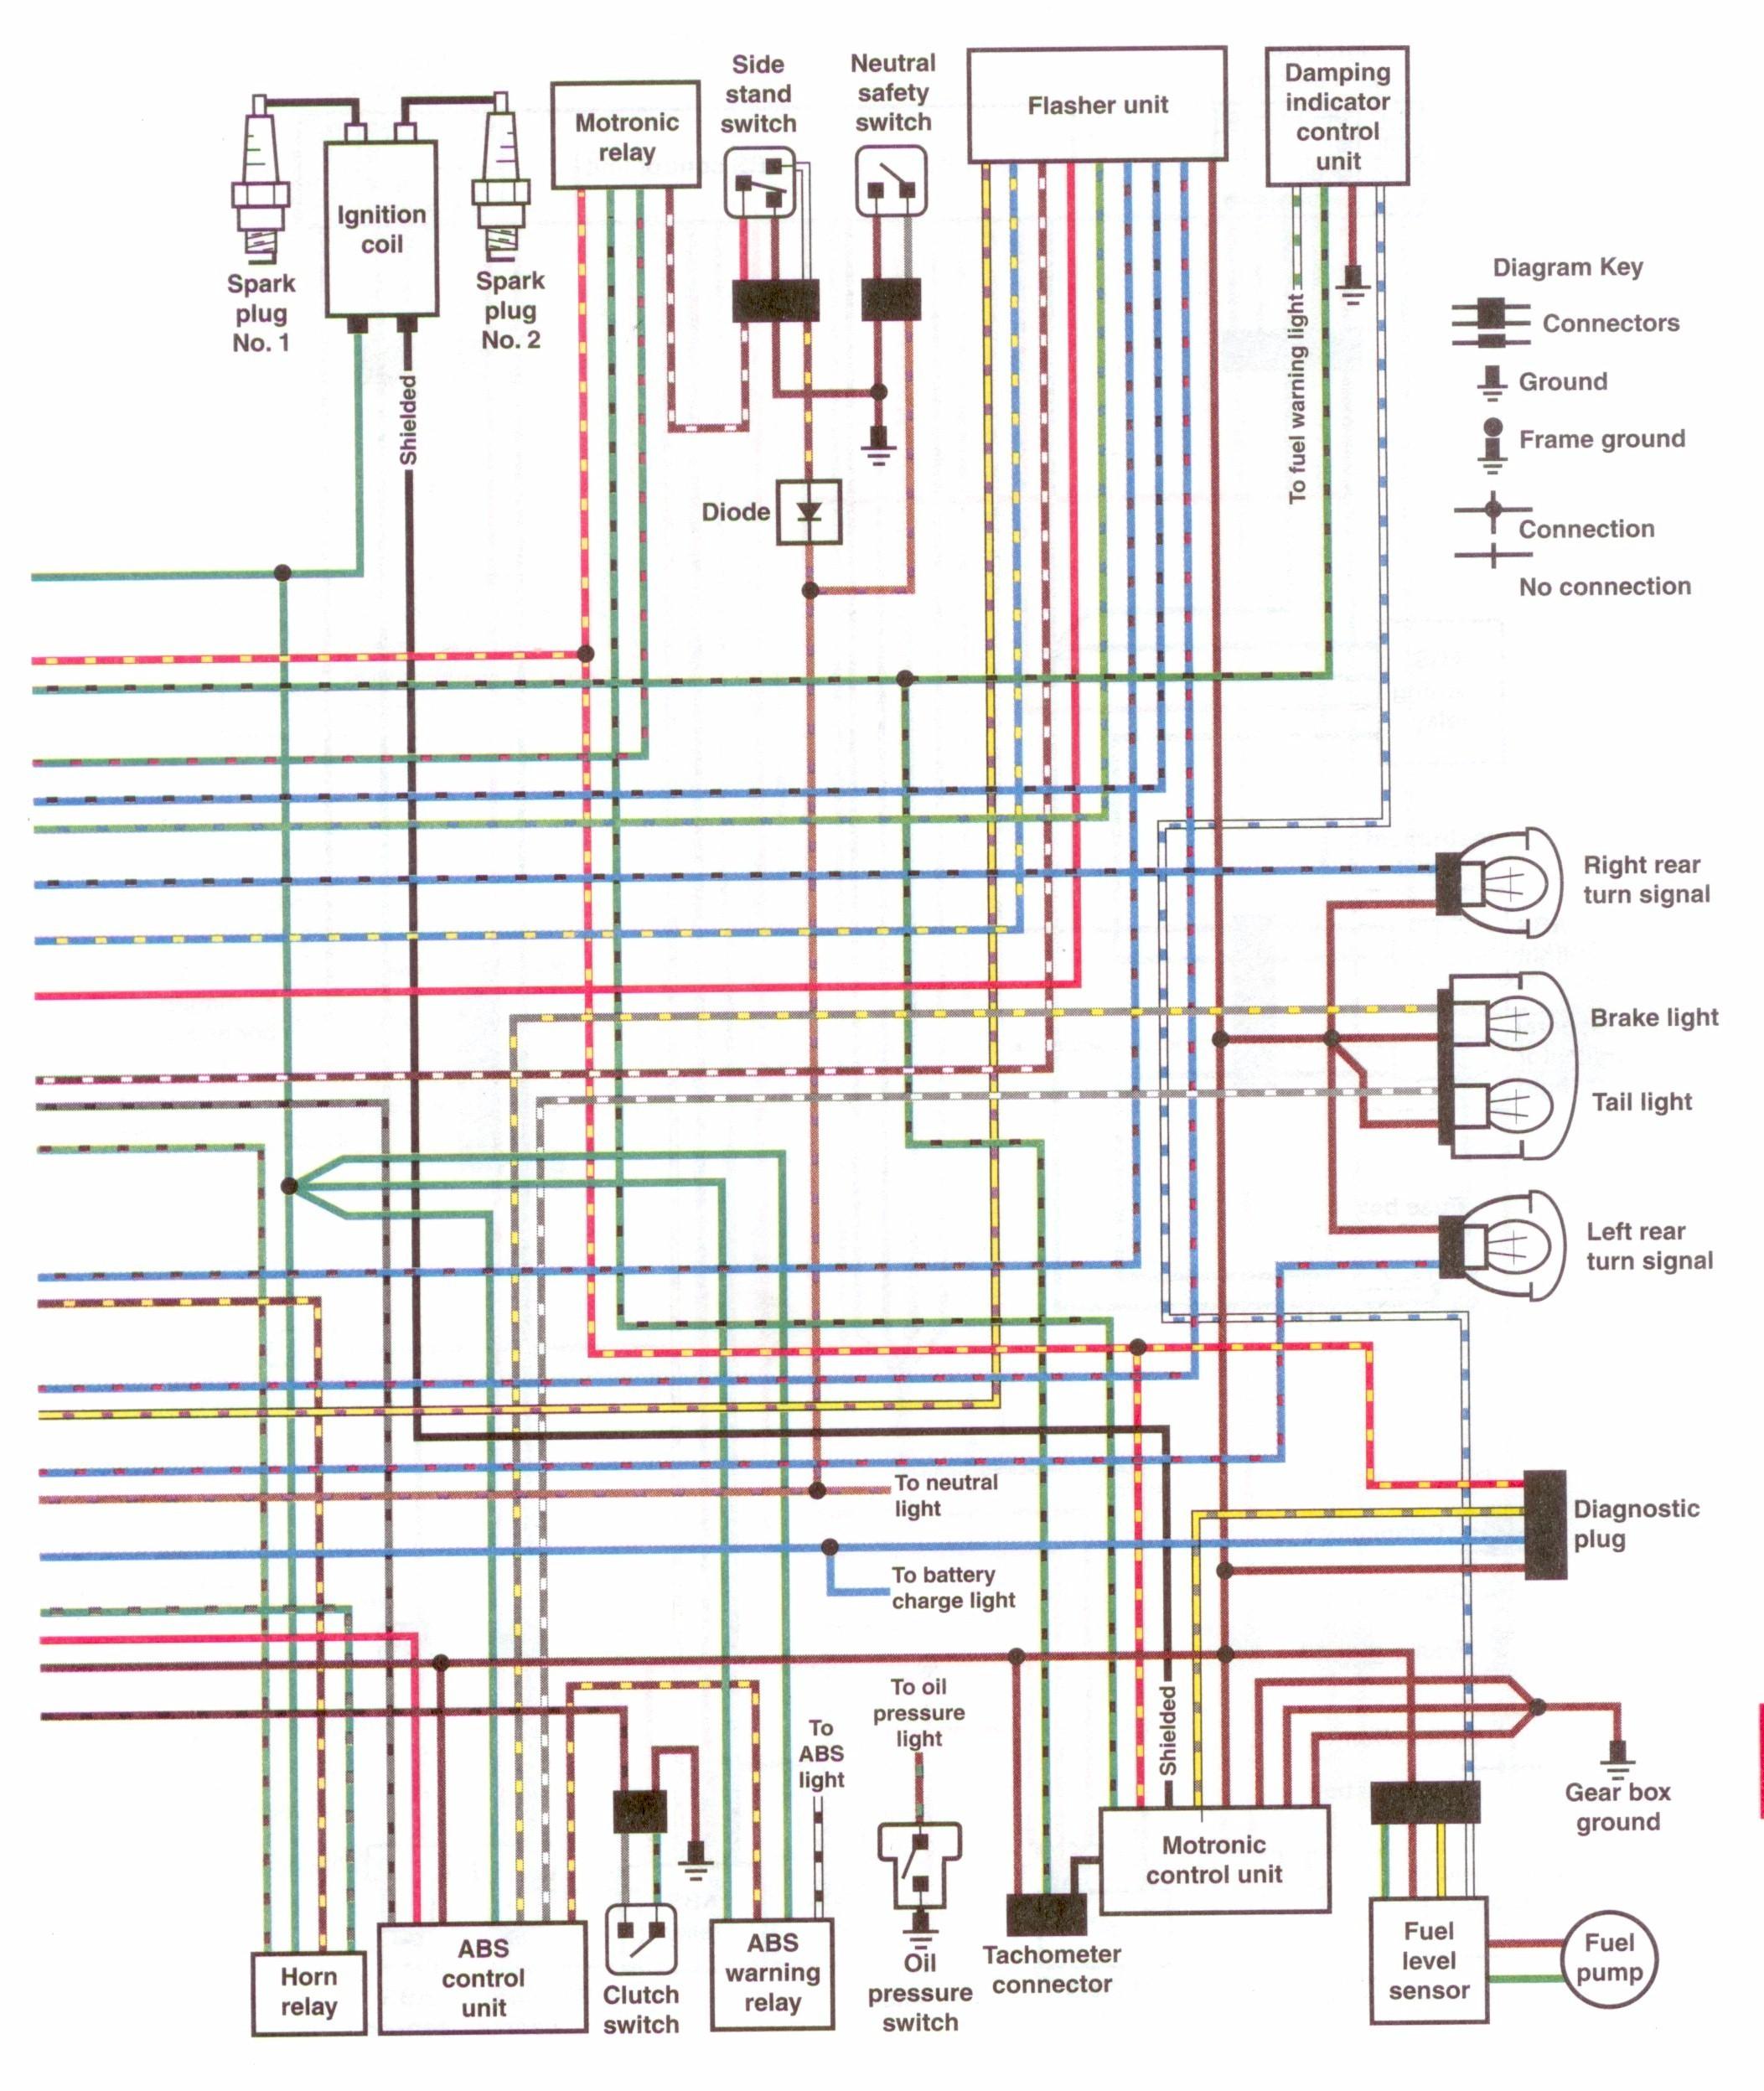 2006 Bmw 530i Engine Diagram Bmw 530i Engine Wire Diagram Another Blog About Wiring Diagram • Of 2006 Bmw 530i Engine Diagram